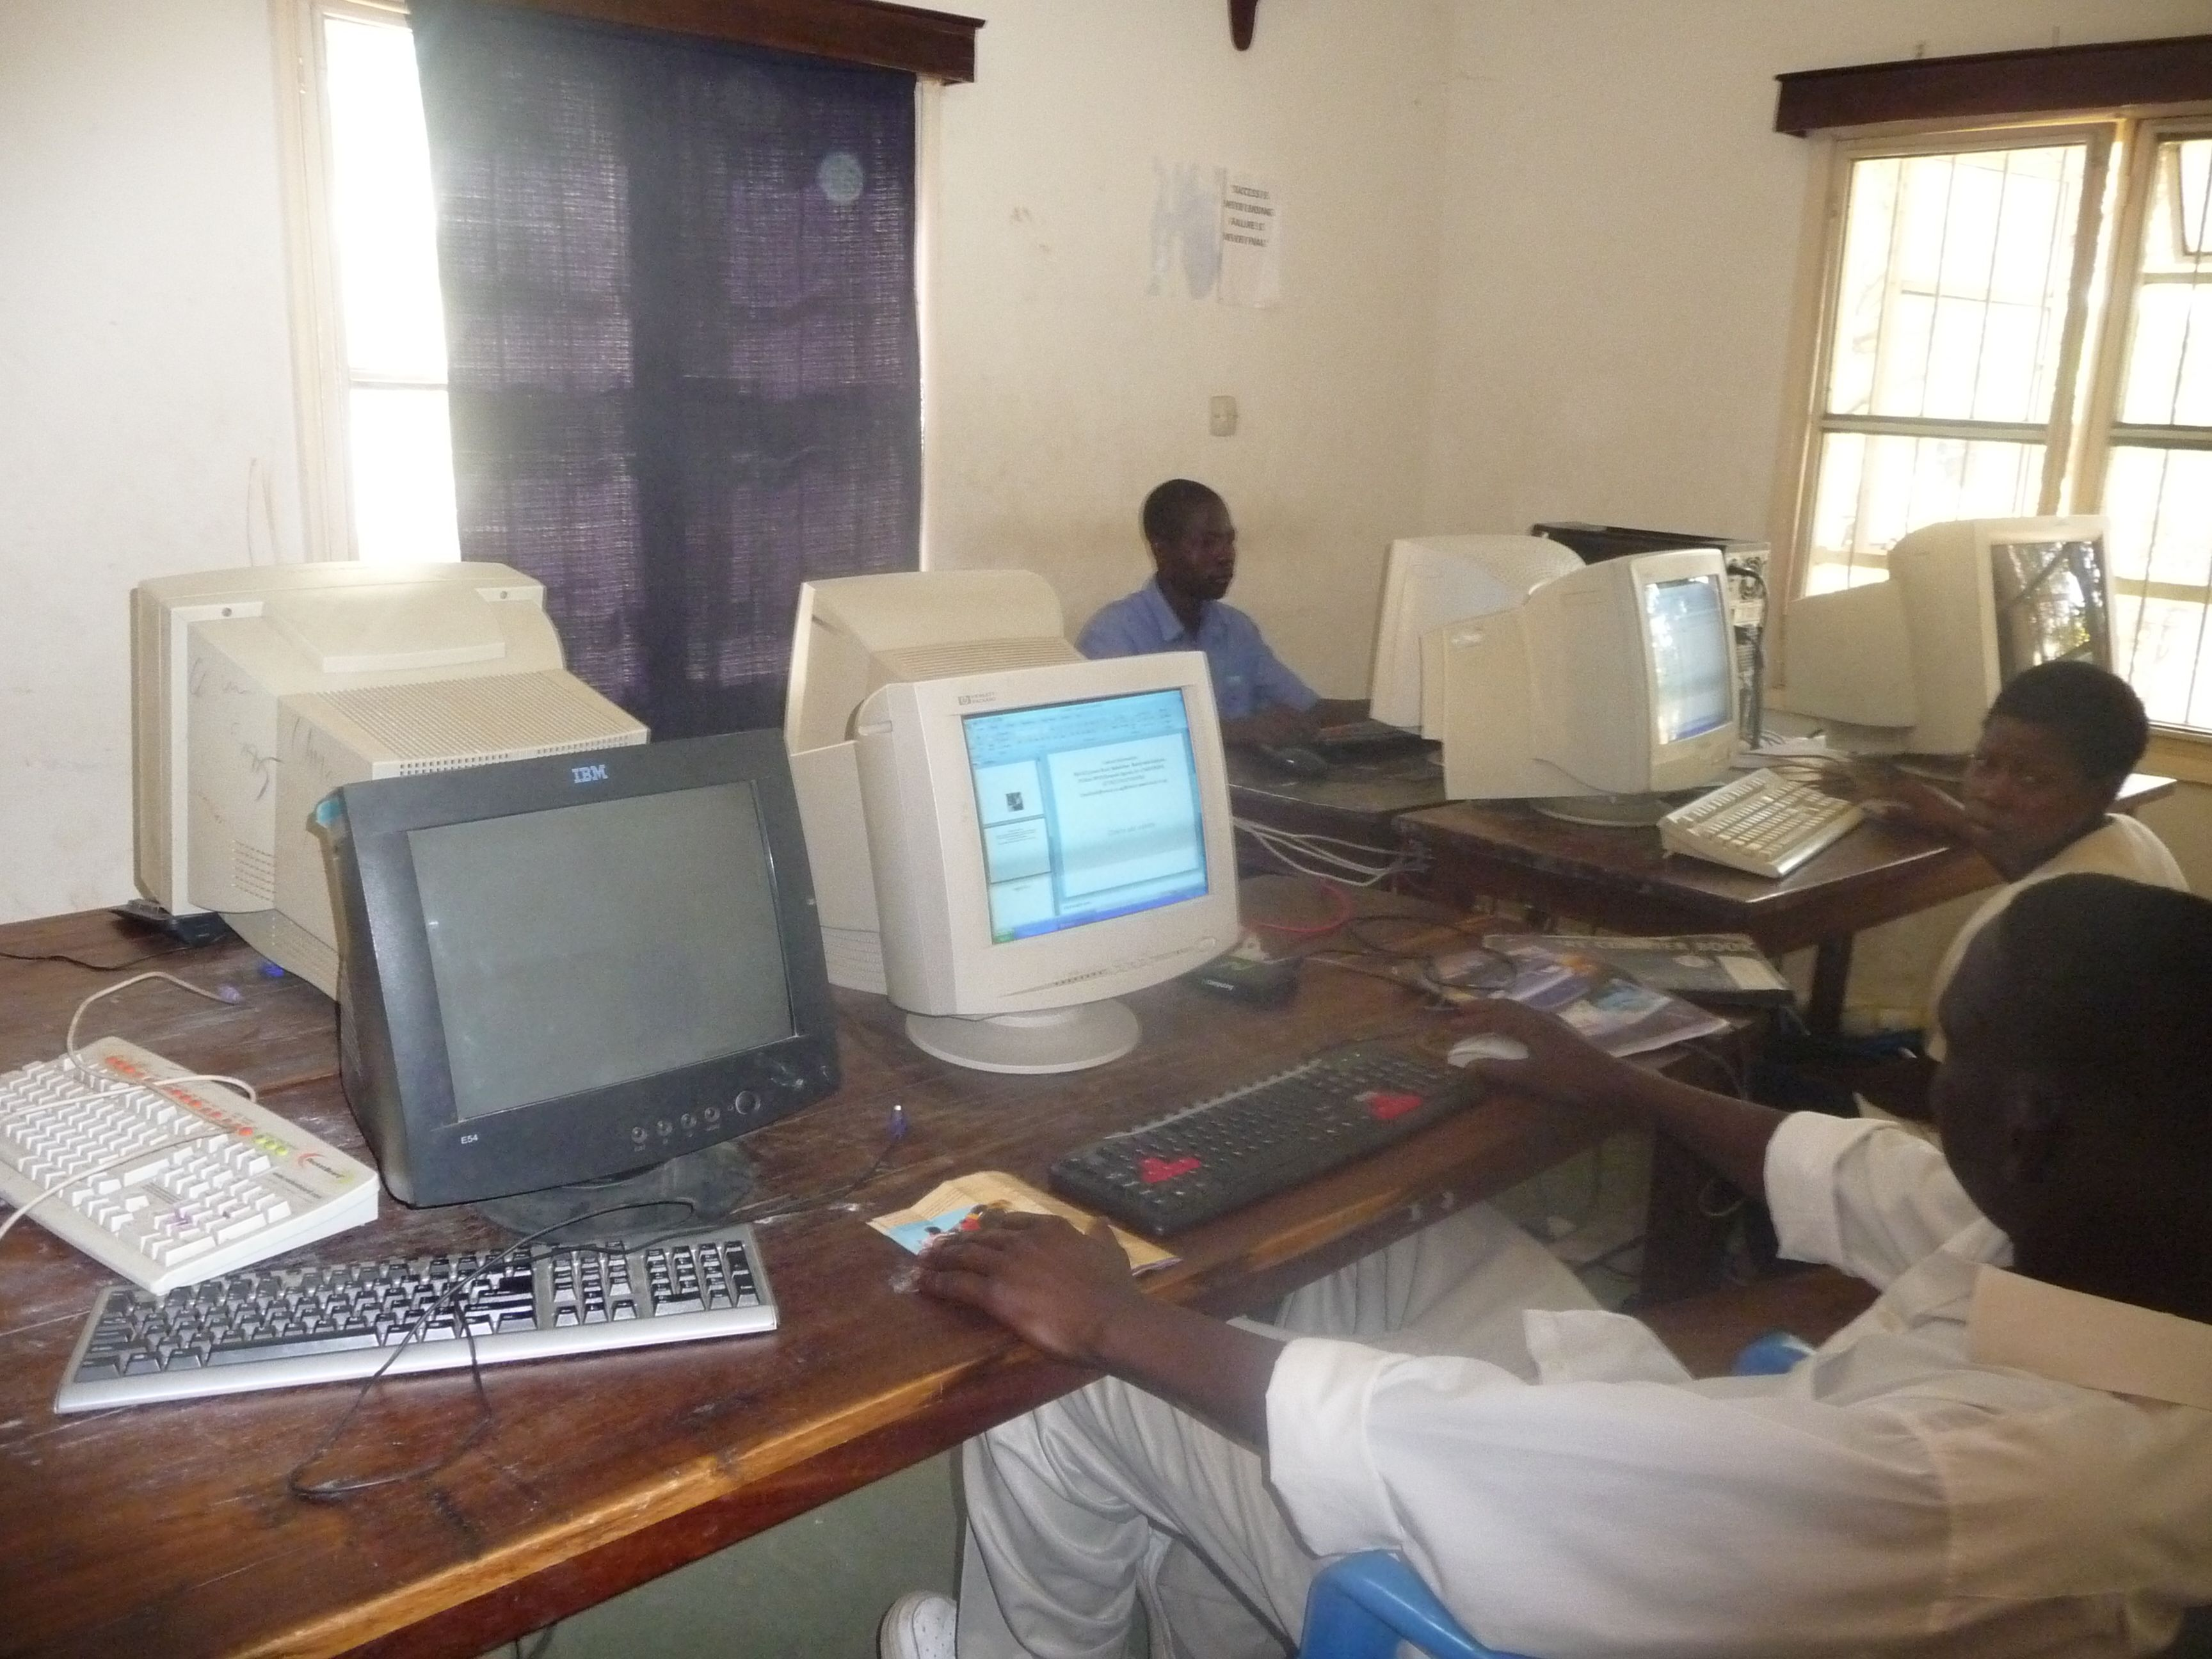 UMCAT: School of Journalism, Mass Communication and Business Studies #TFBloggers